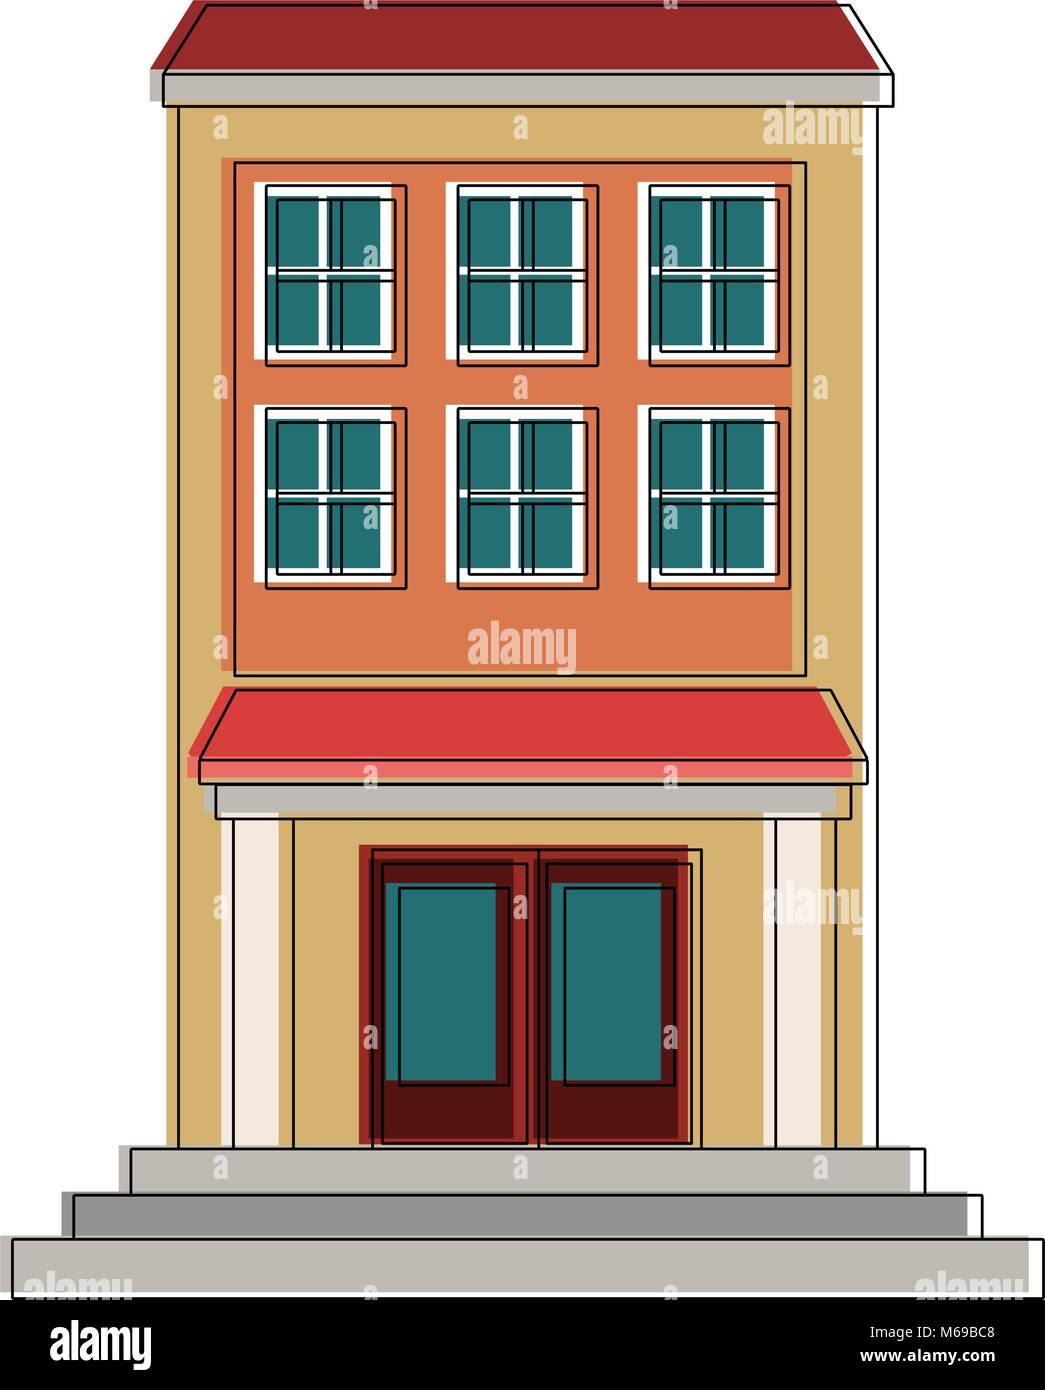 edifice building cartoon - Stock Image